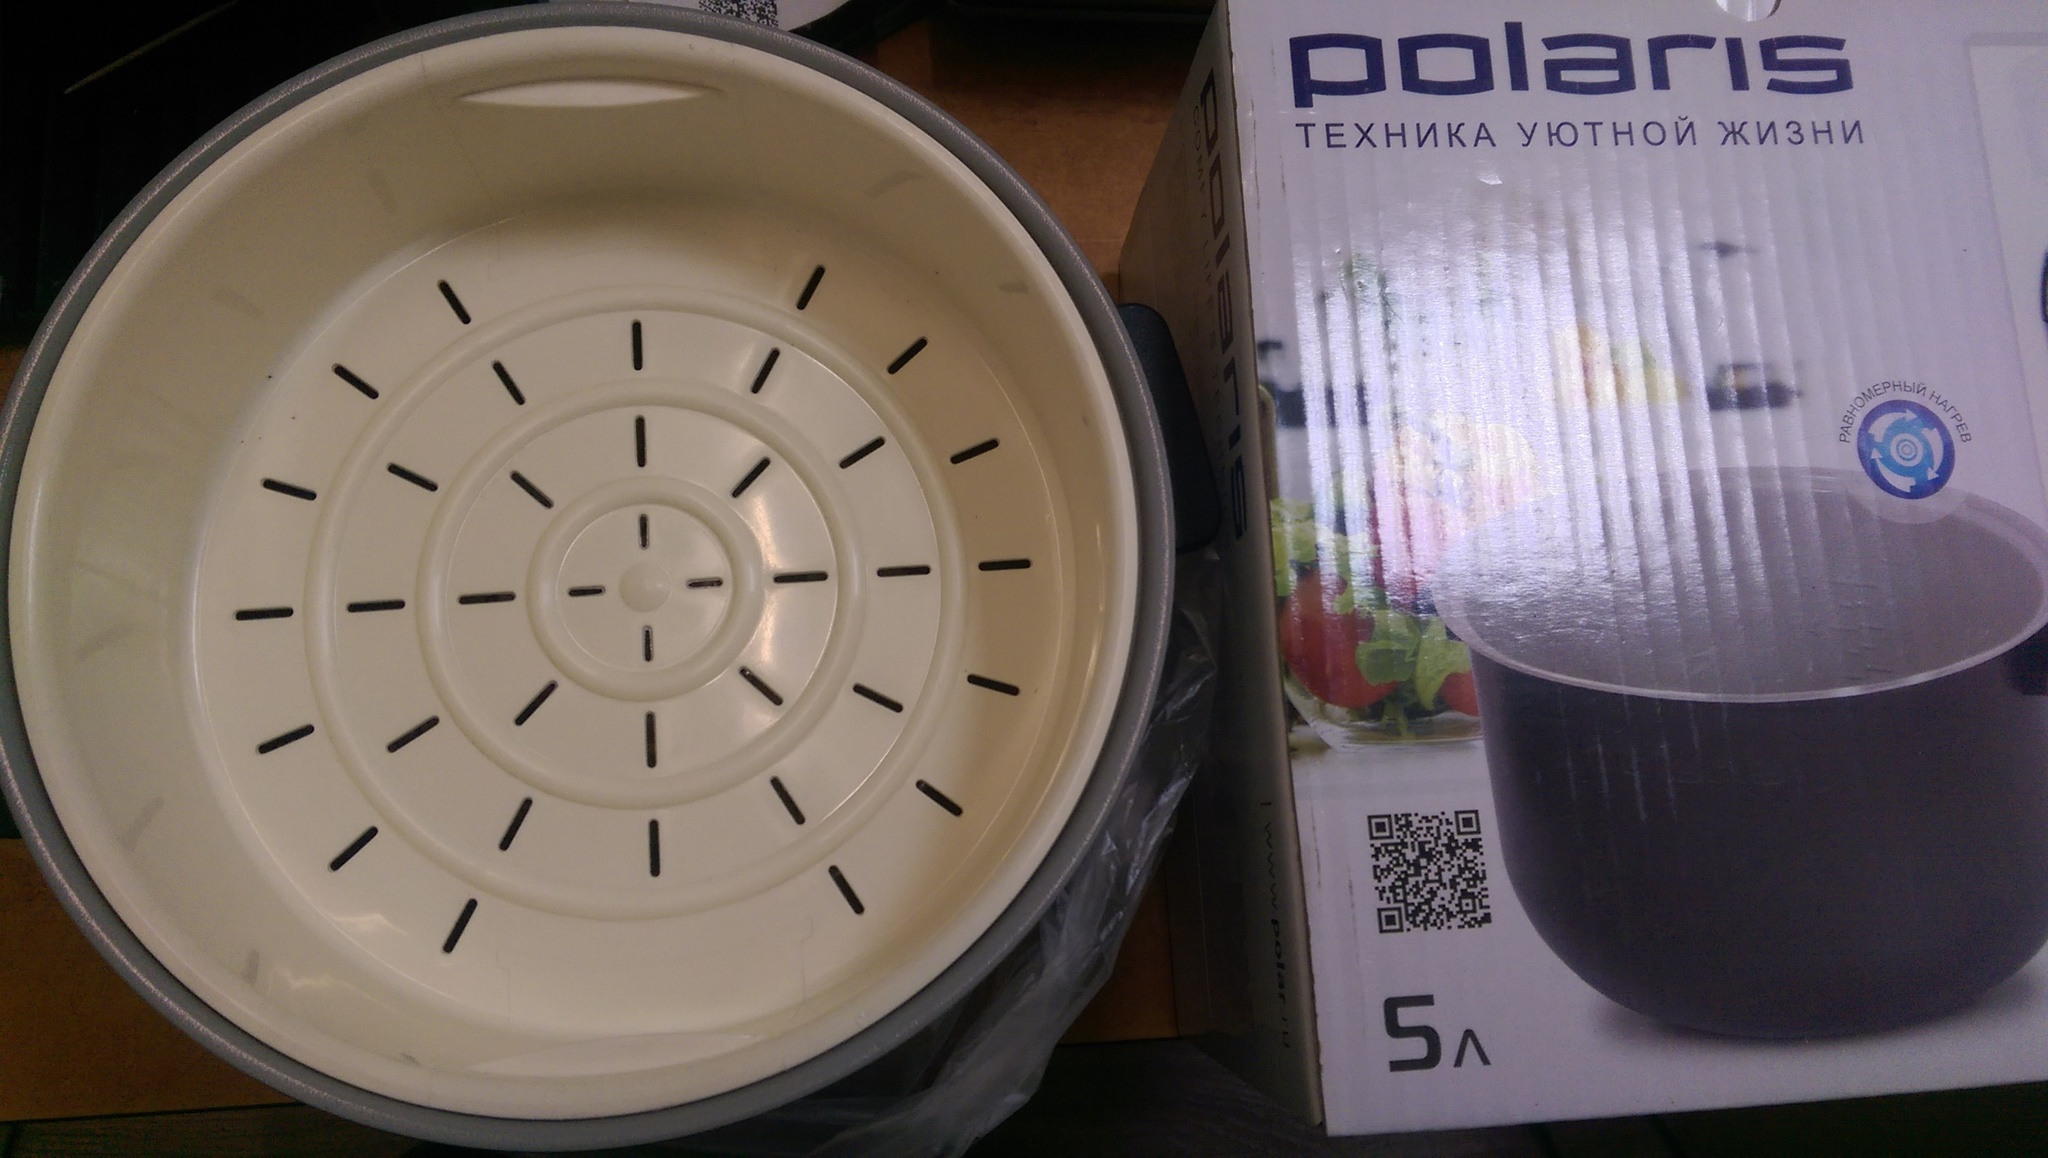 Сетка вставка для мультиварки Polaris для готовки на пару